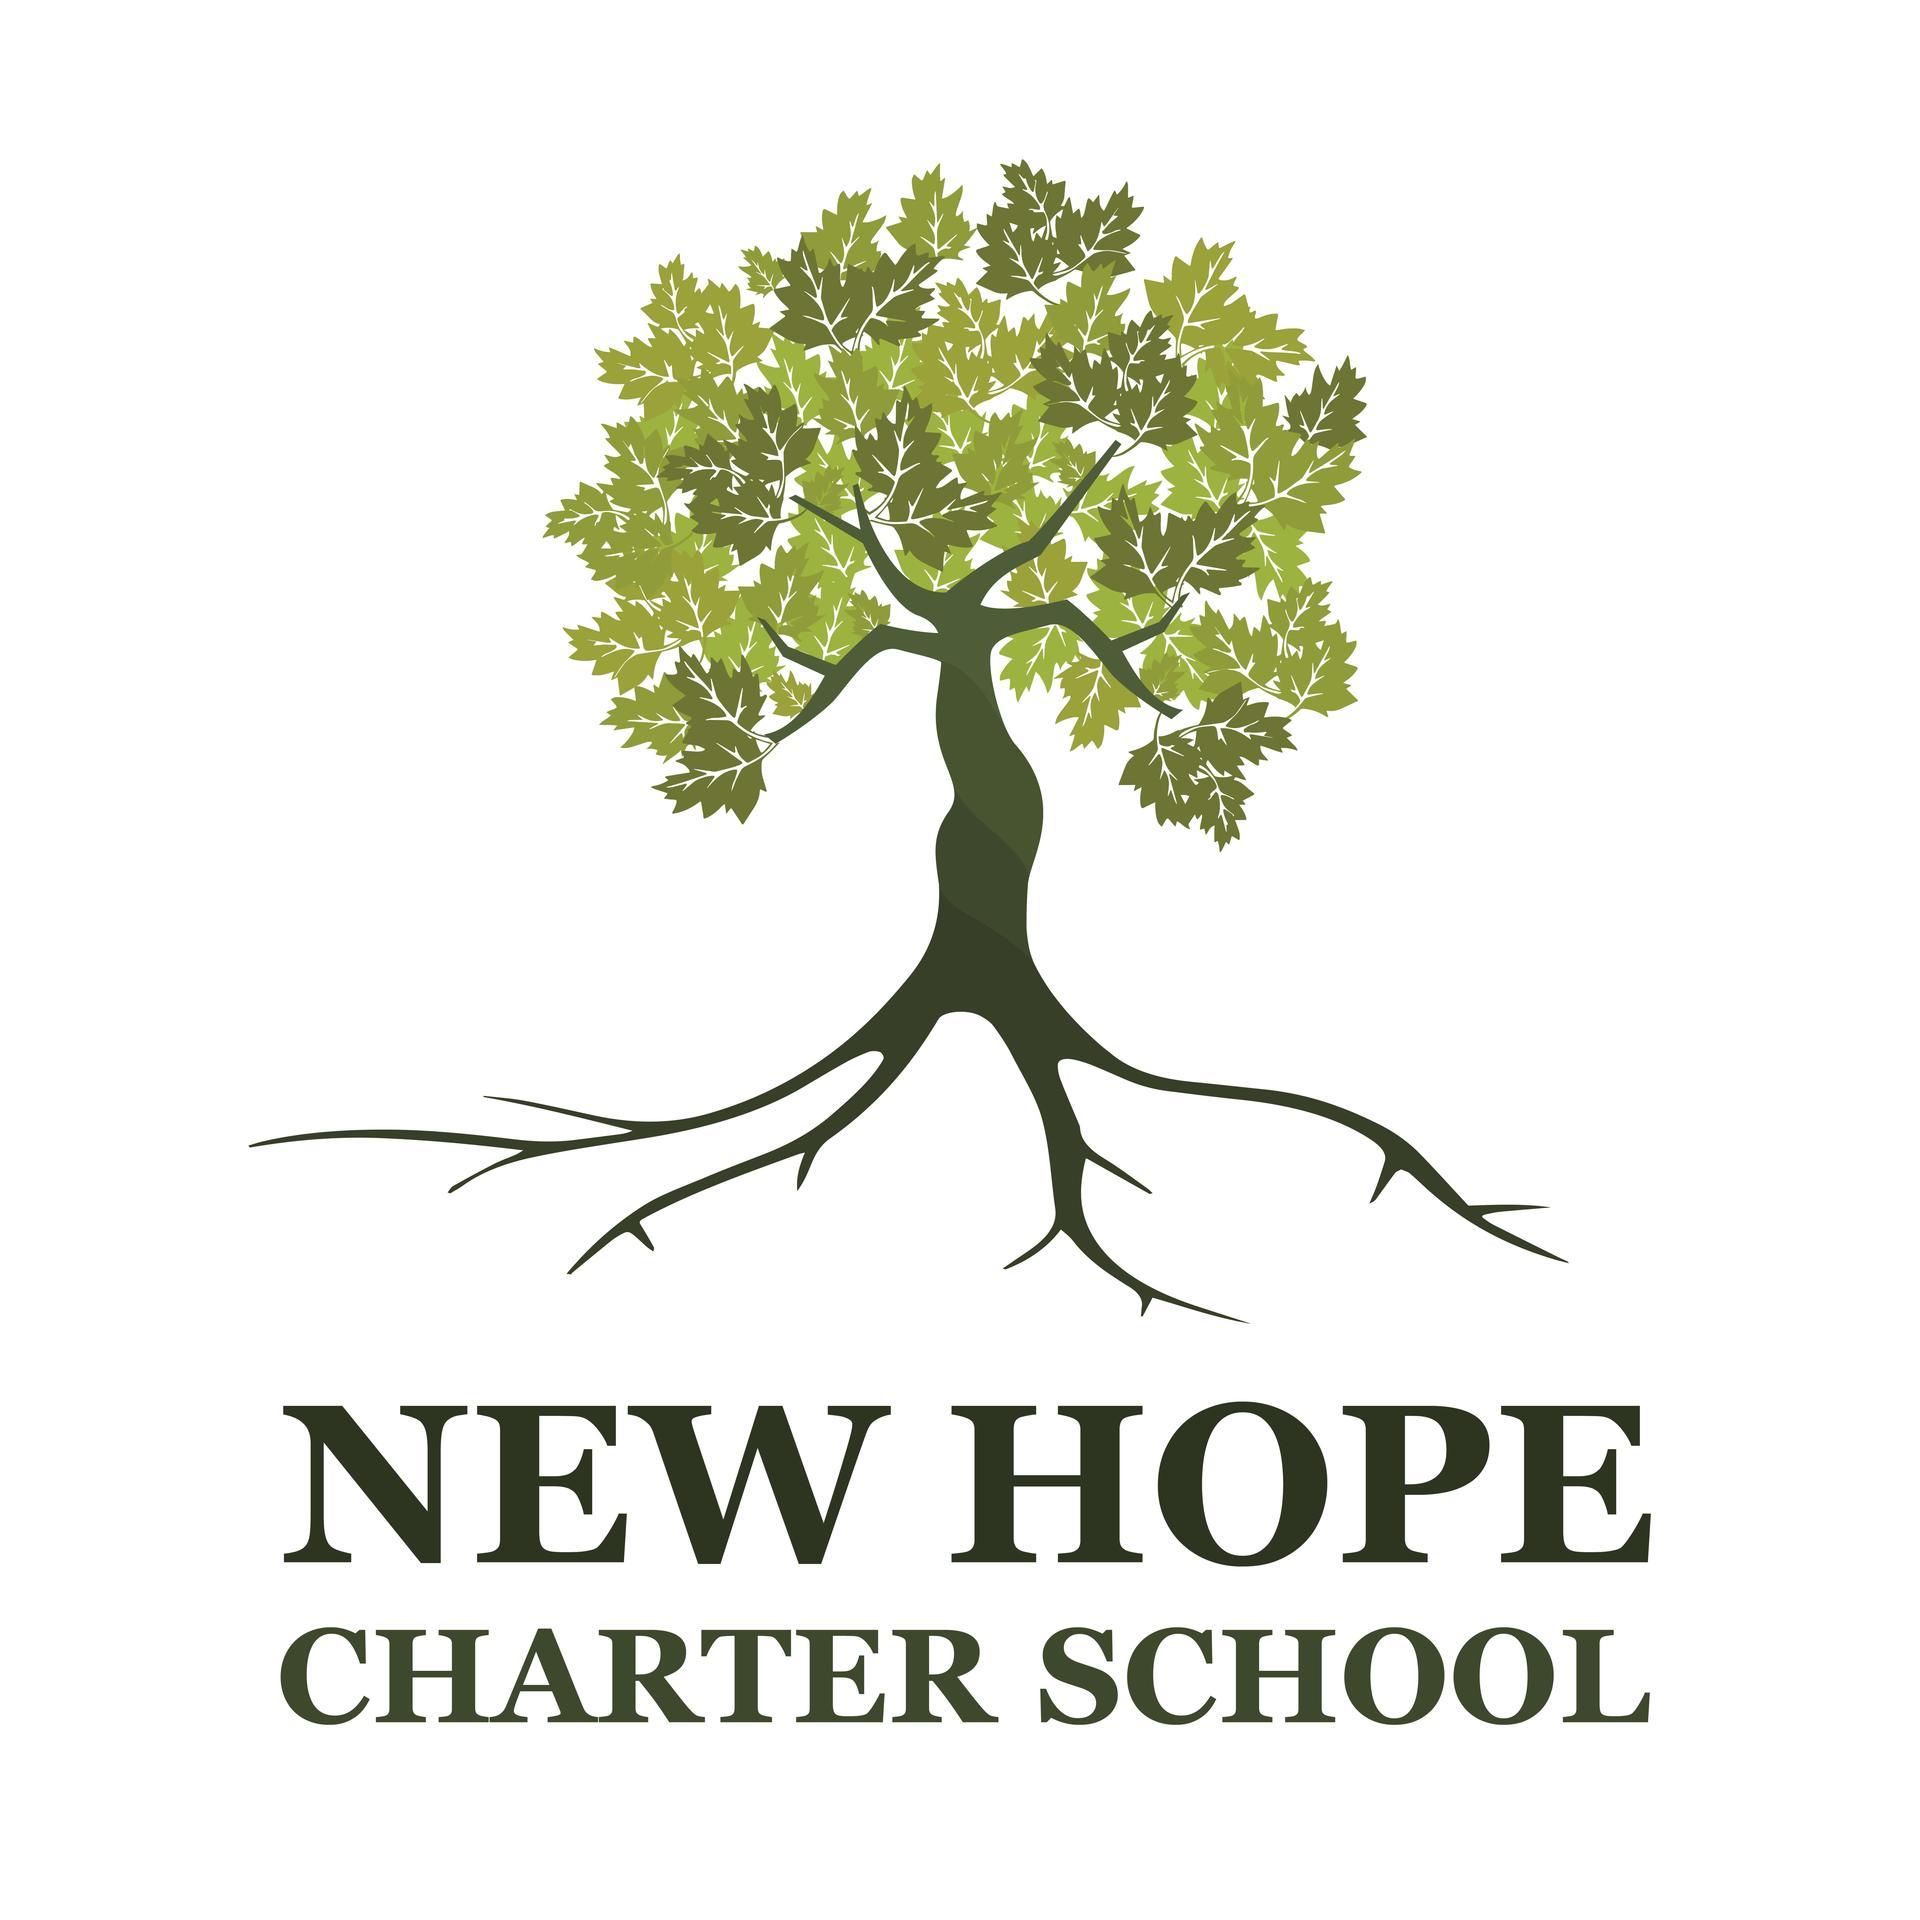 New Hope Charter School Logo